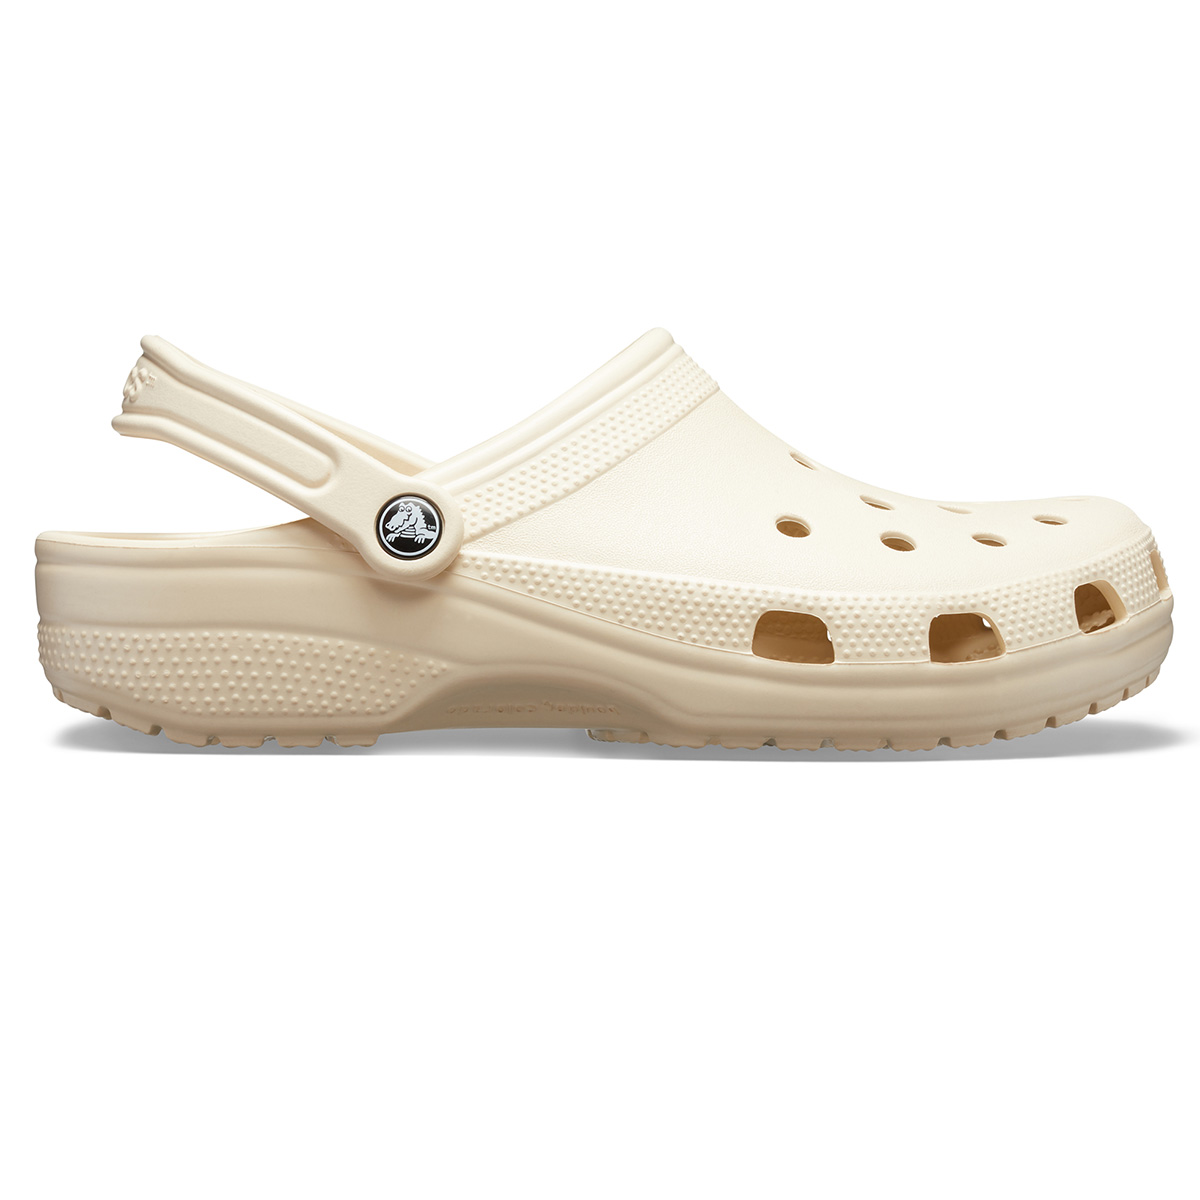 Crocs Classic - Kış Beyazı